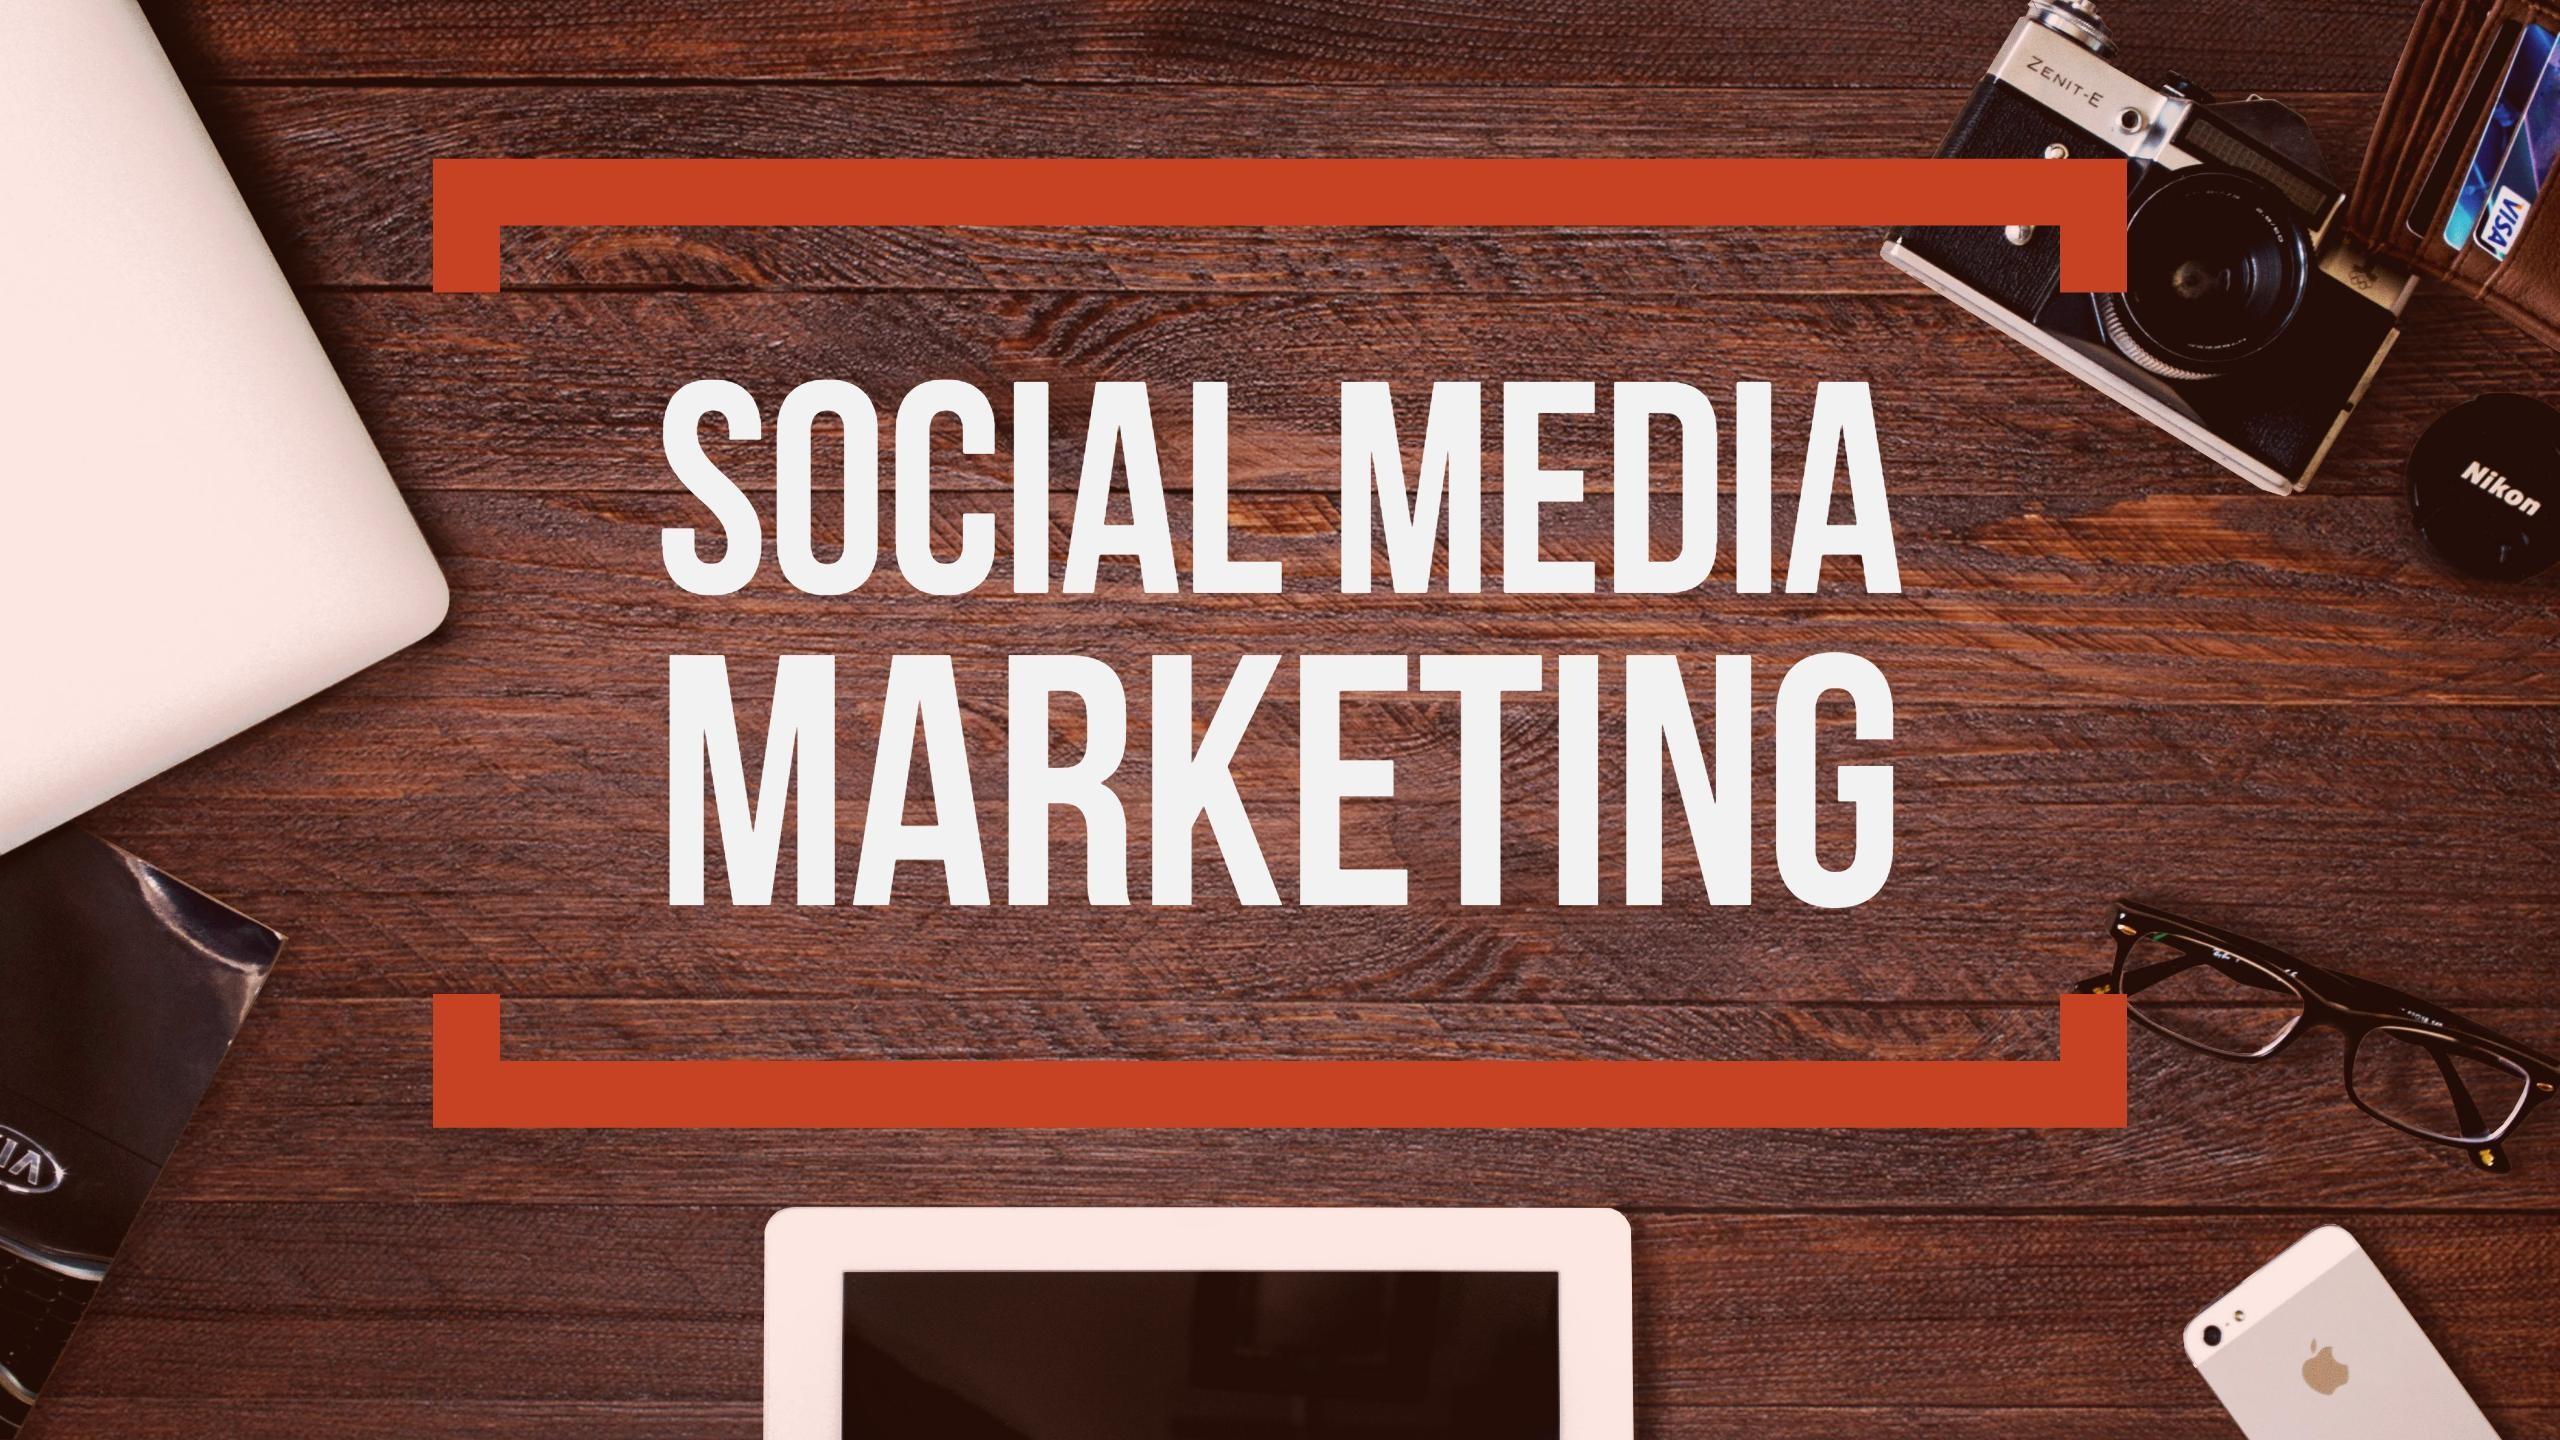 NADA GLOBAL offers expert social media marketing.